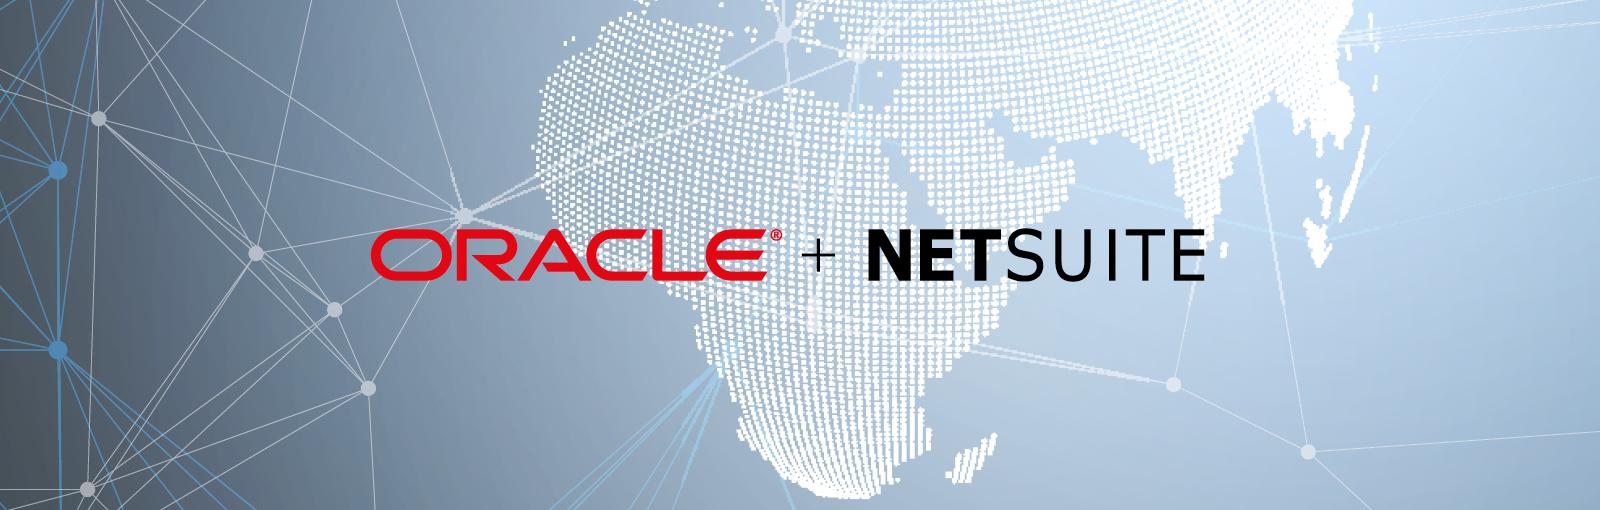 Oracle NetSuite Named a Leader by Gartner